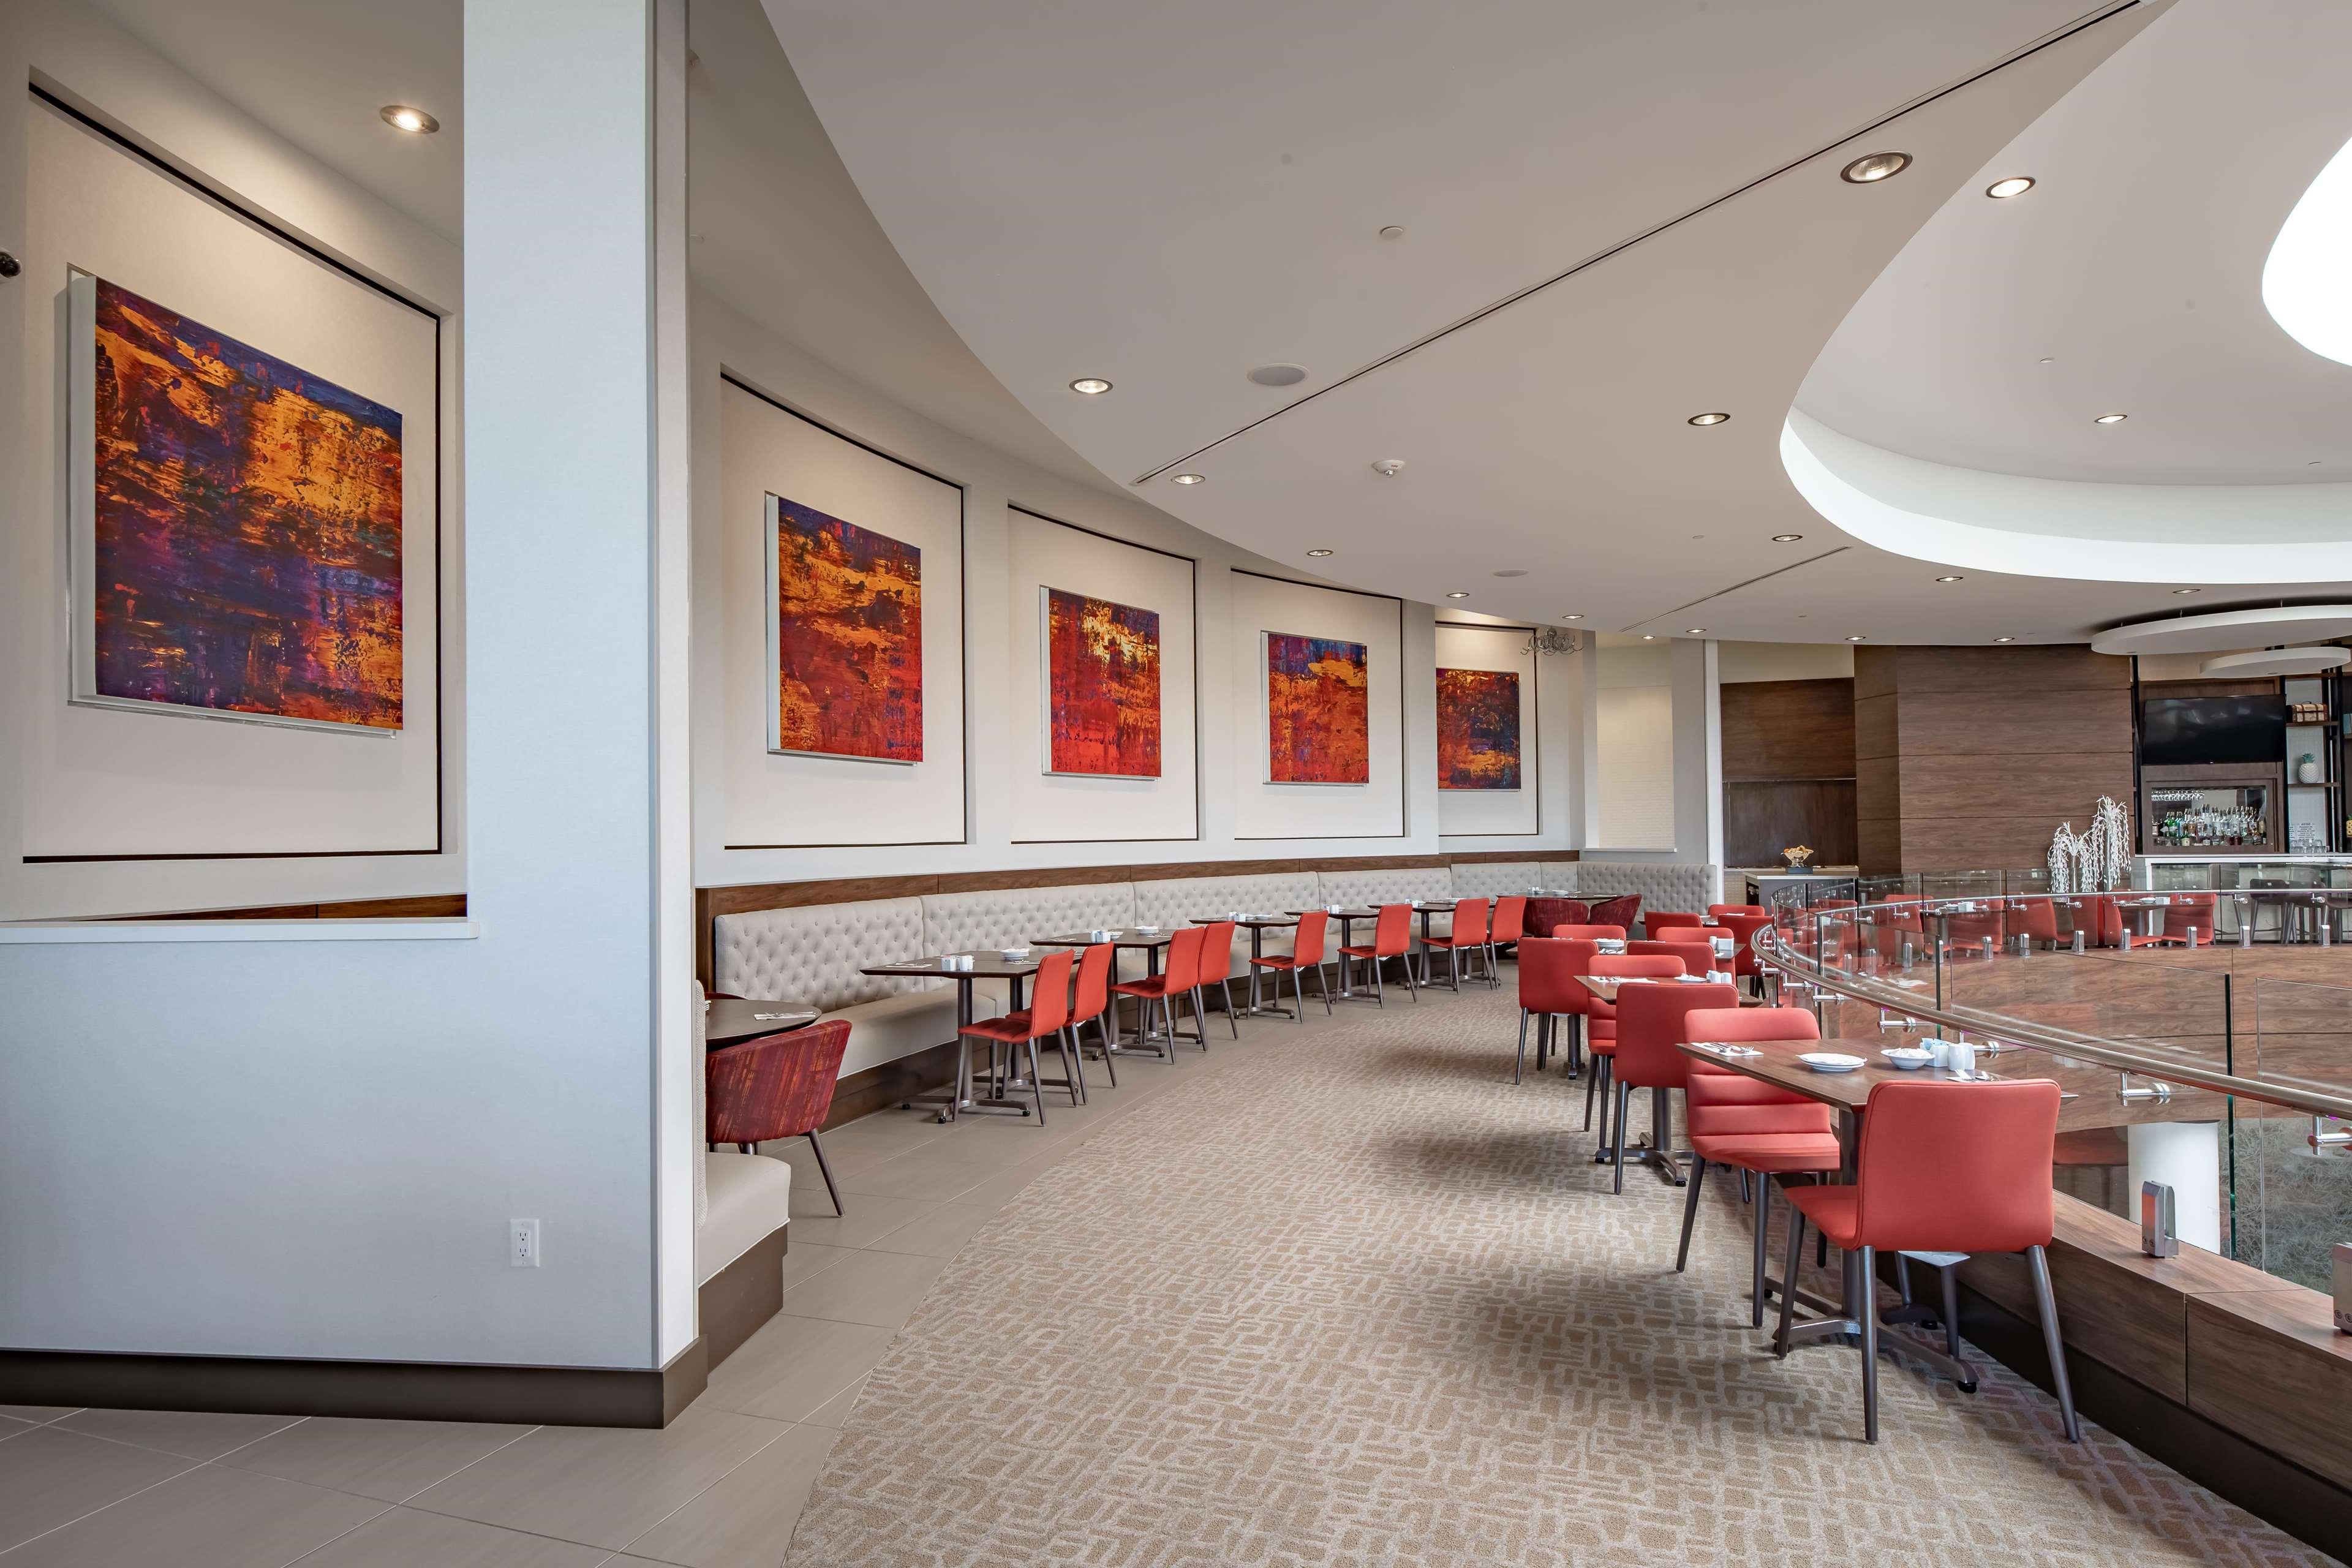 Hilton Garden Inn Dallas at Hurst Conference Center image 17